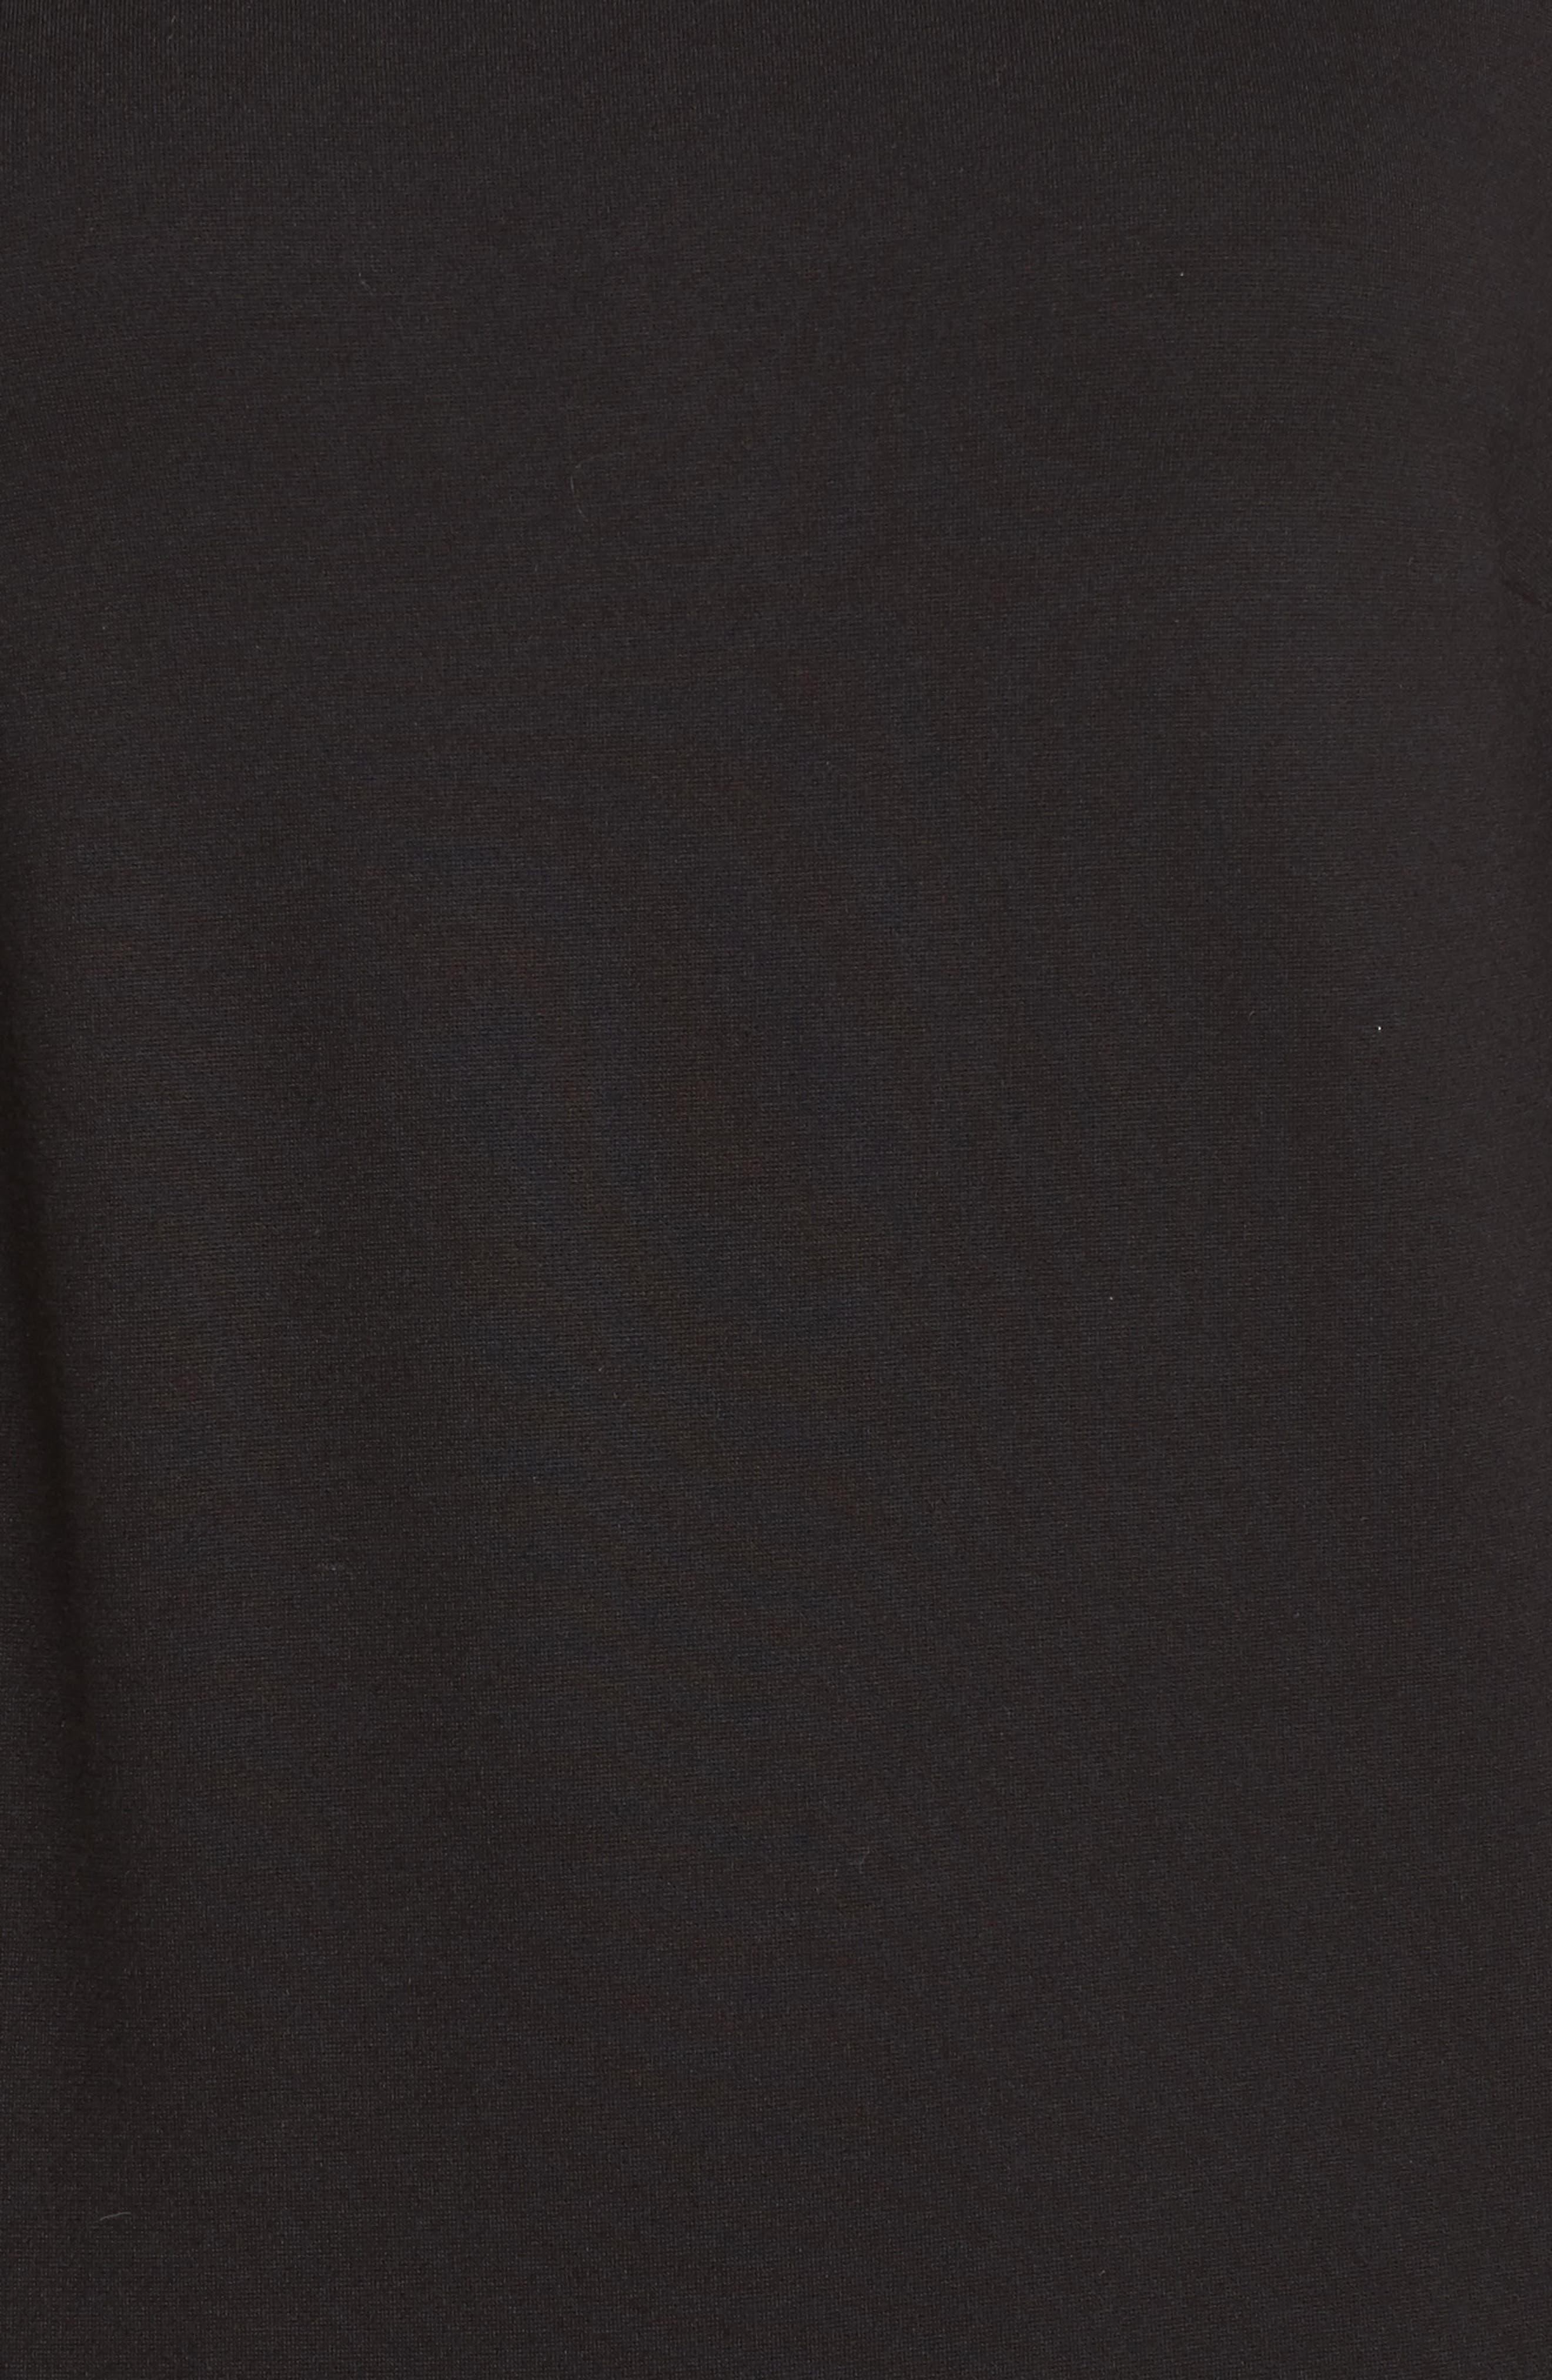 Matuku Lula Bell Sleeve Dress,                             Alternate thumbnail 5, color,                             Black